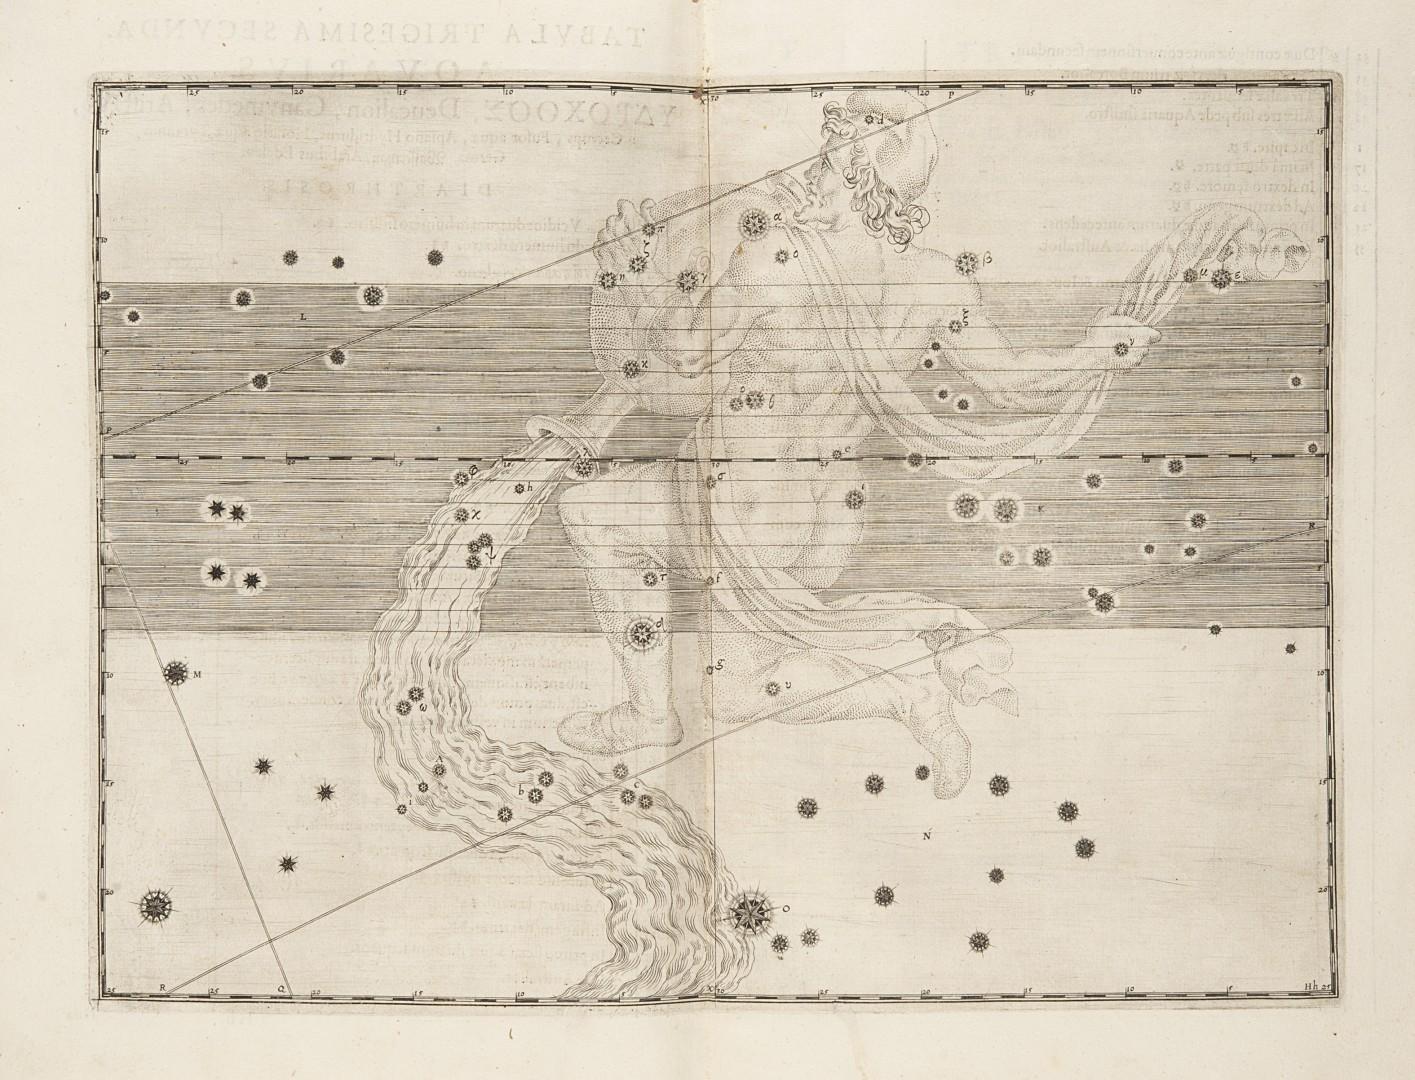 Bayer, Johann Uranometria, omnium asterismorum continens schemata, nova methodo delineata, aereis la